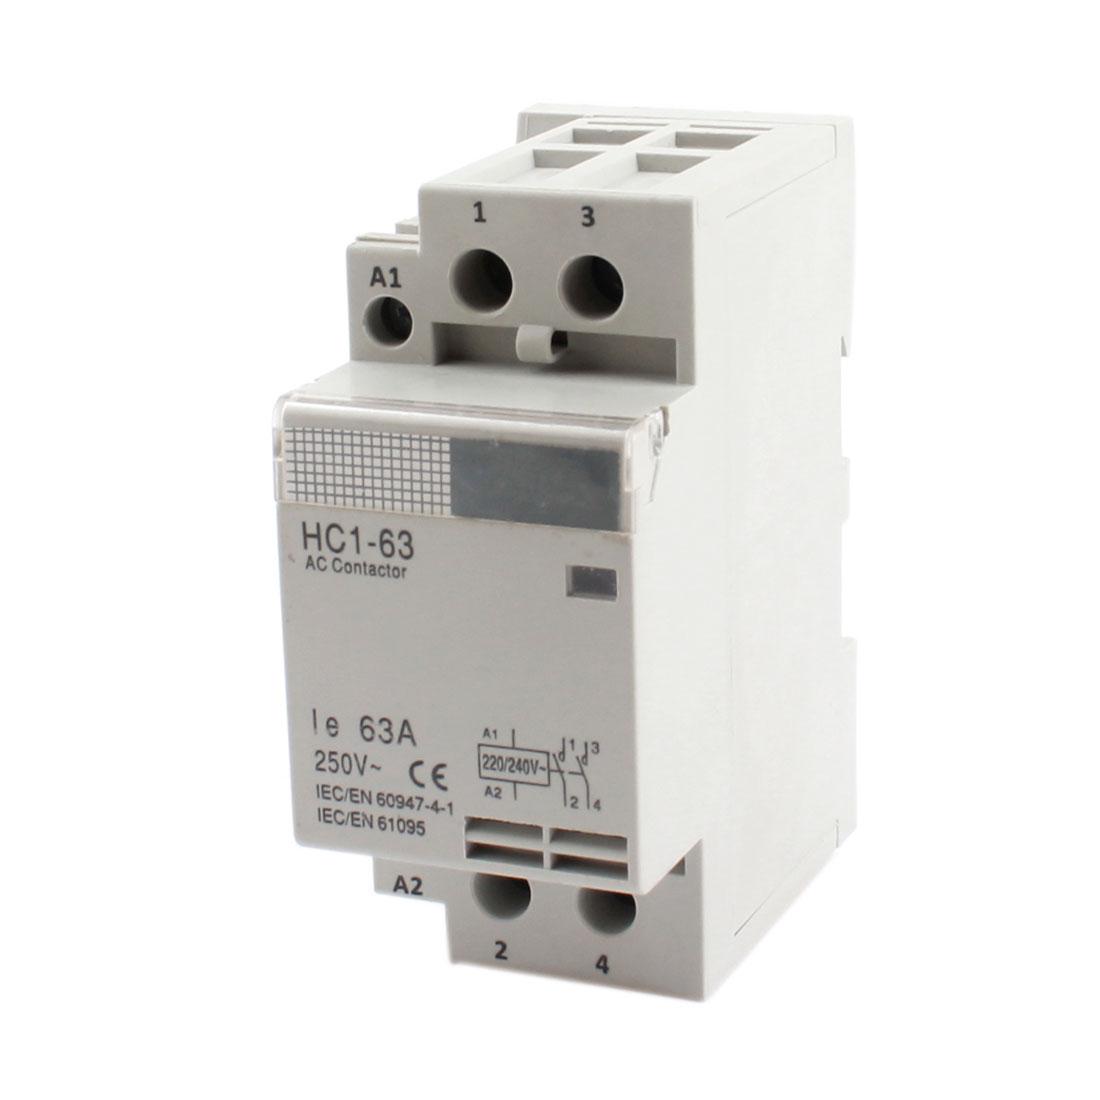 220/240V 63A 35mm DIN Rail Mount 2 Pole Definite Purpose AC Contactor